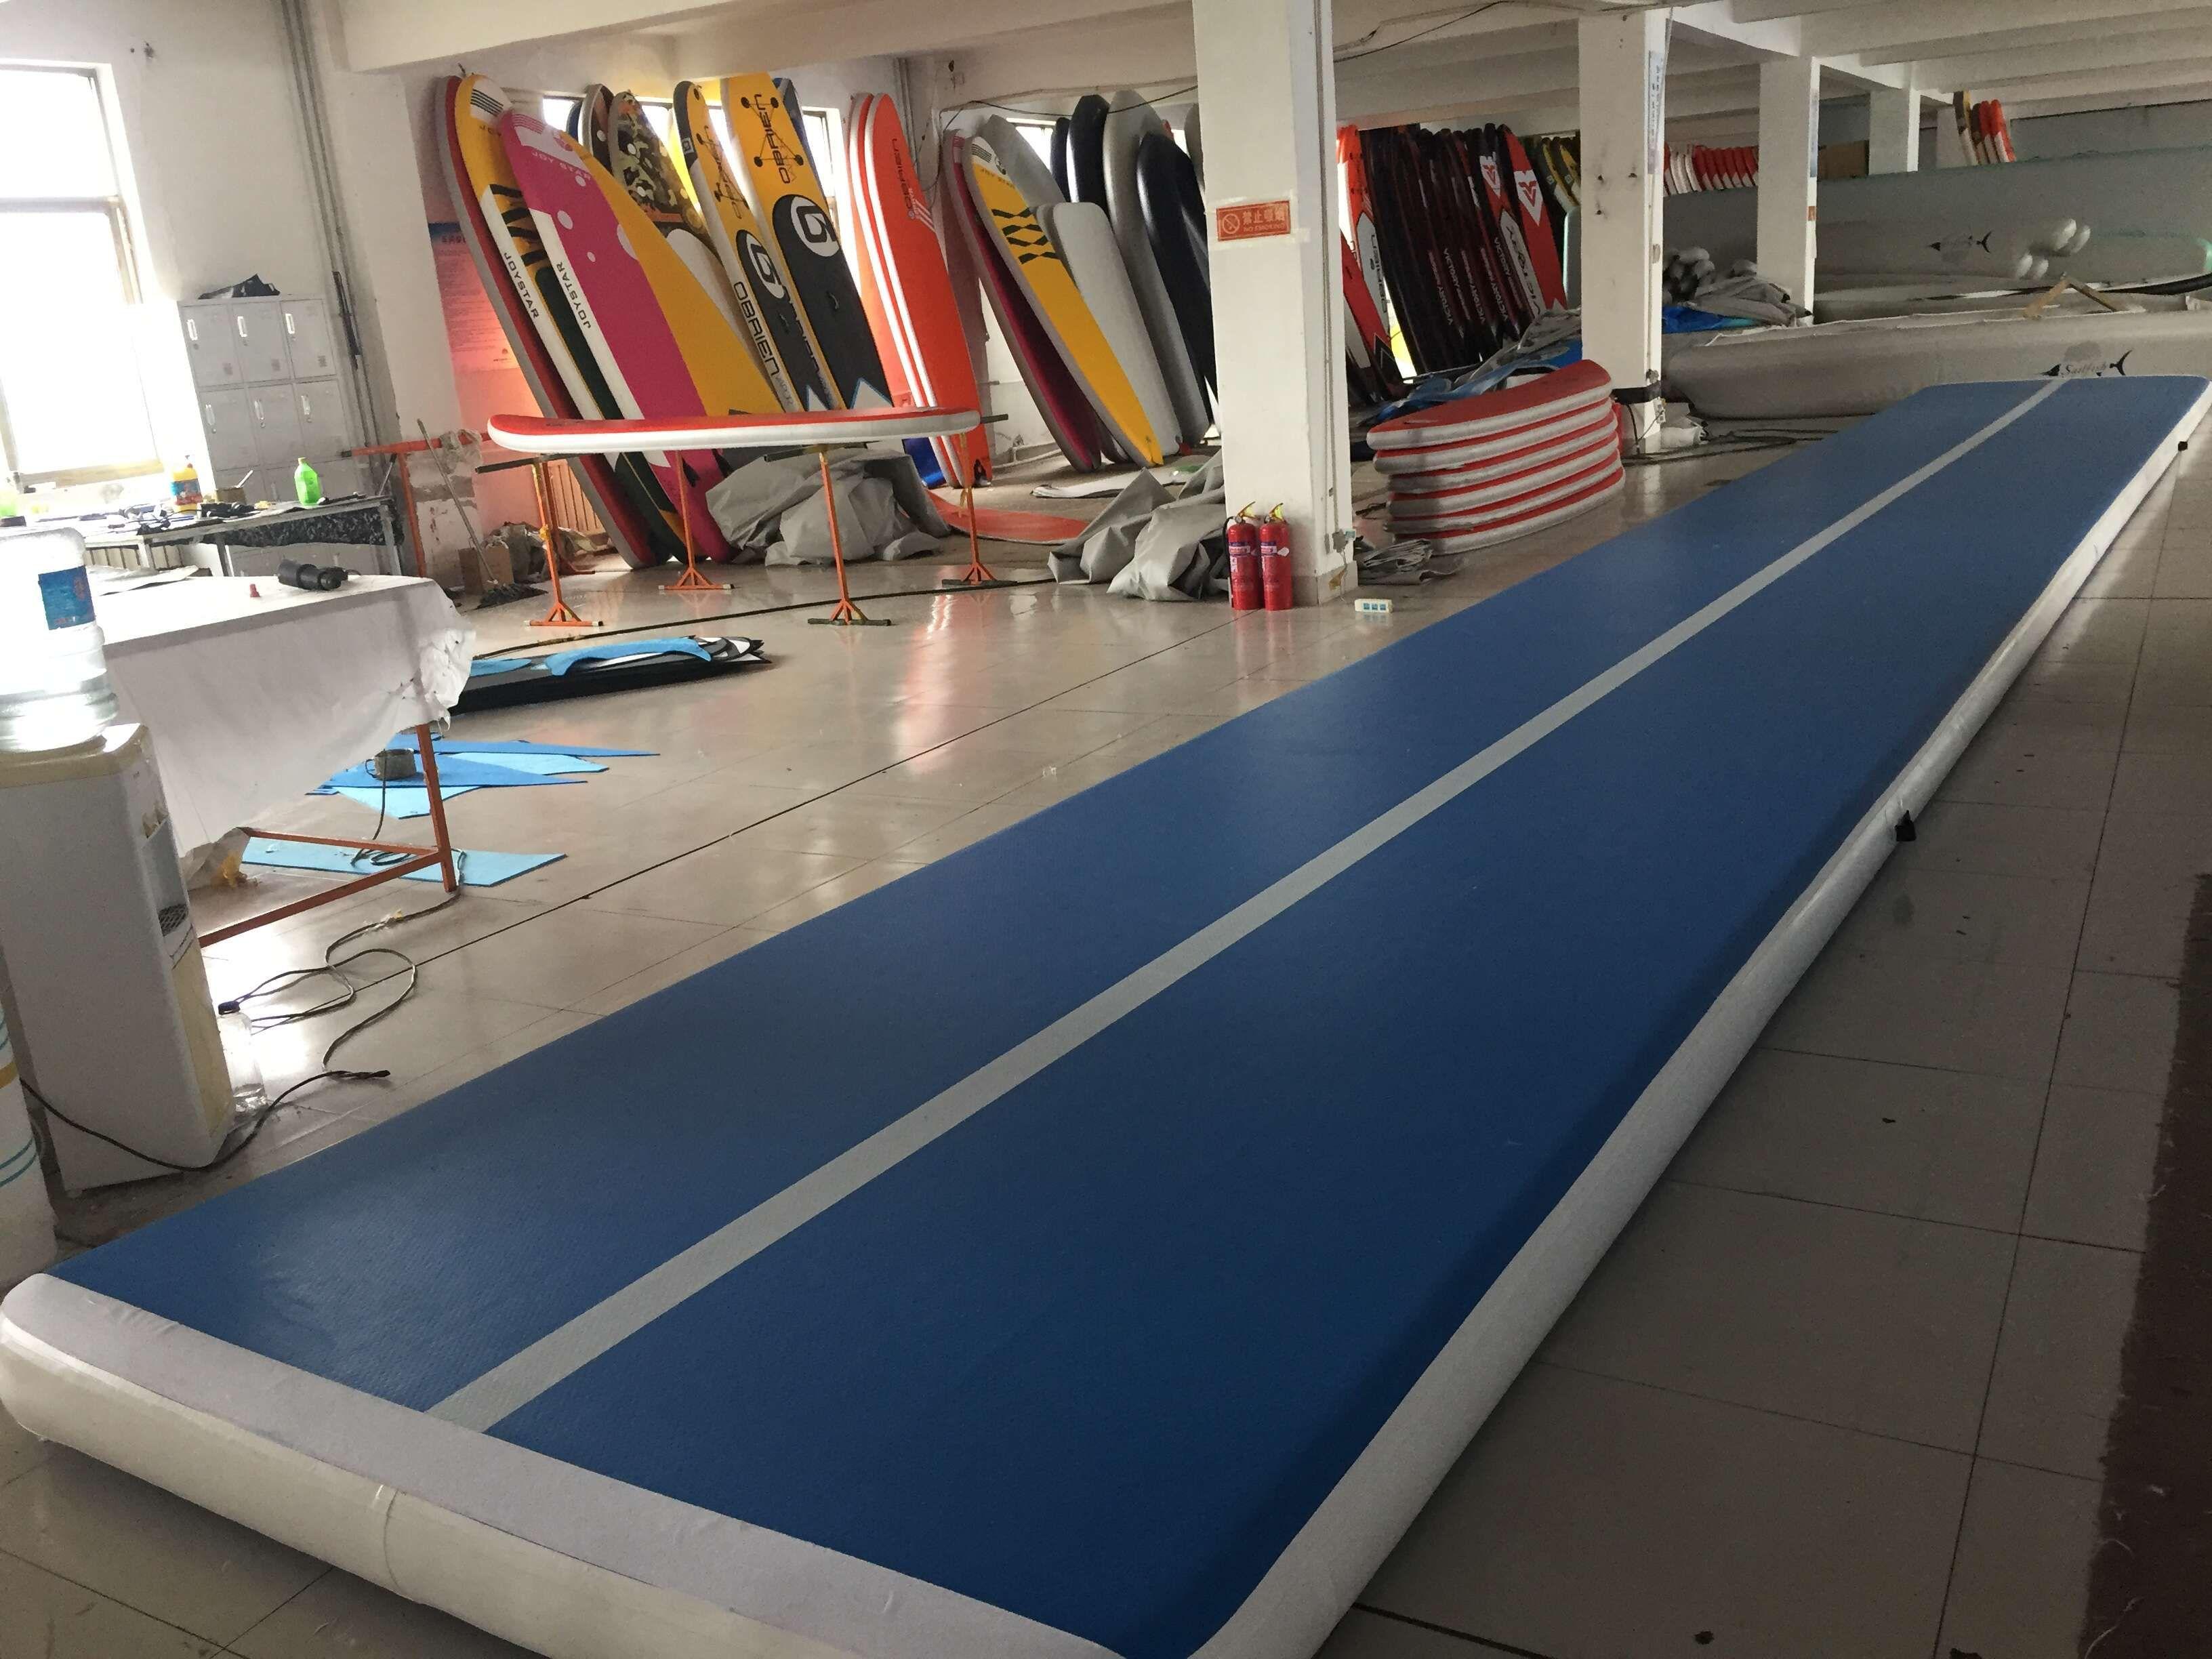 gimnastics diy result image gymnastics gym mats mat home for pin pinterest